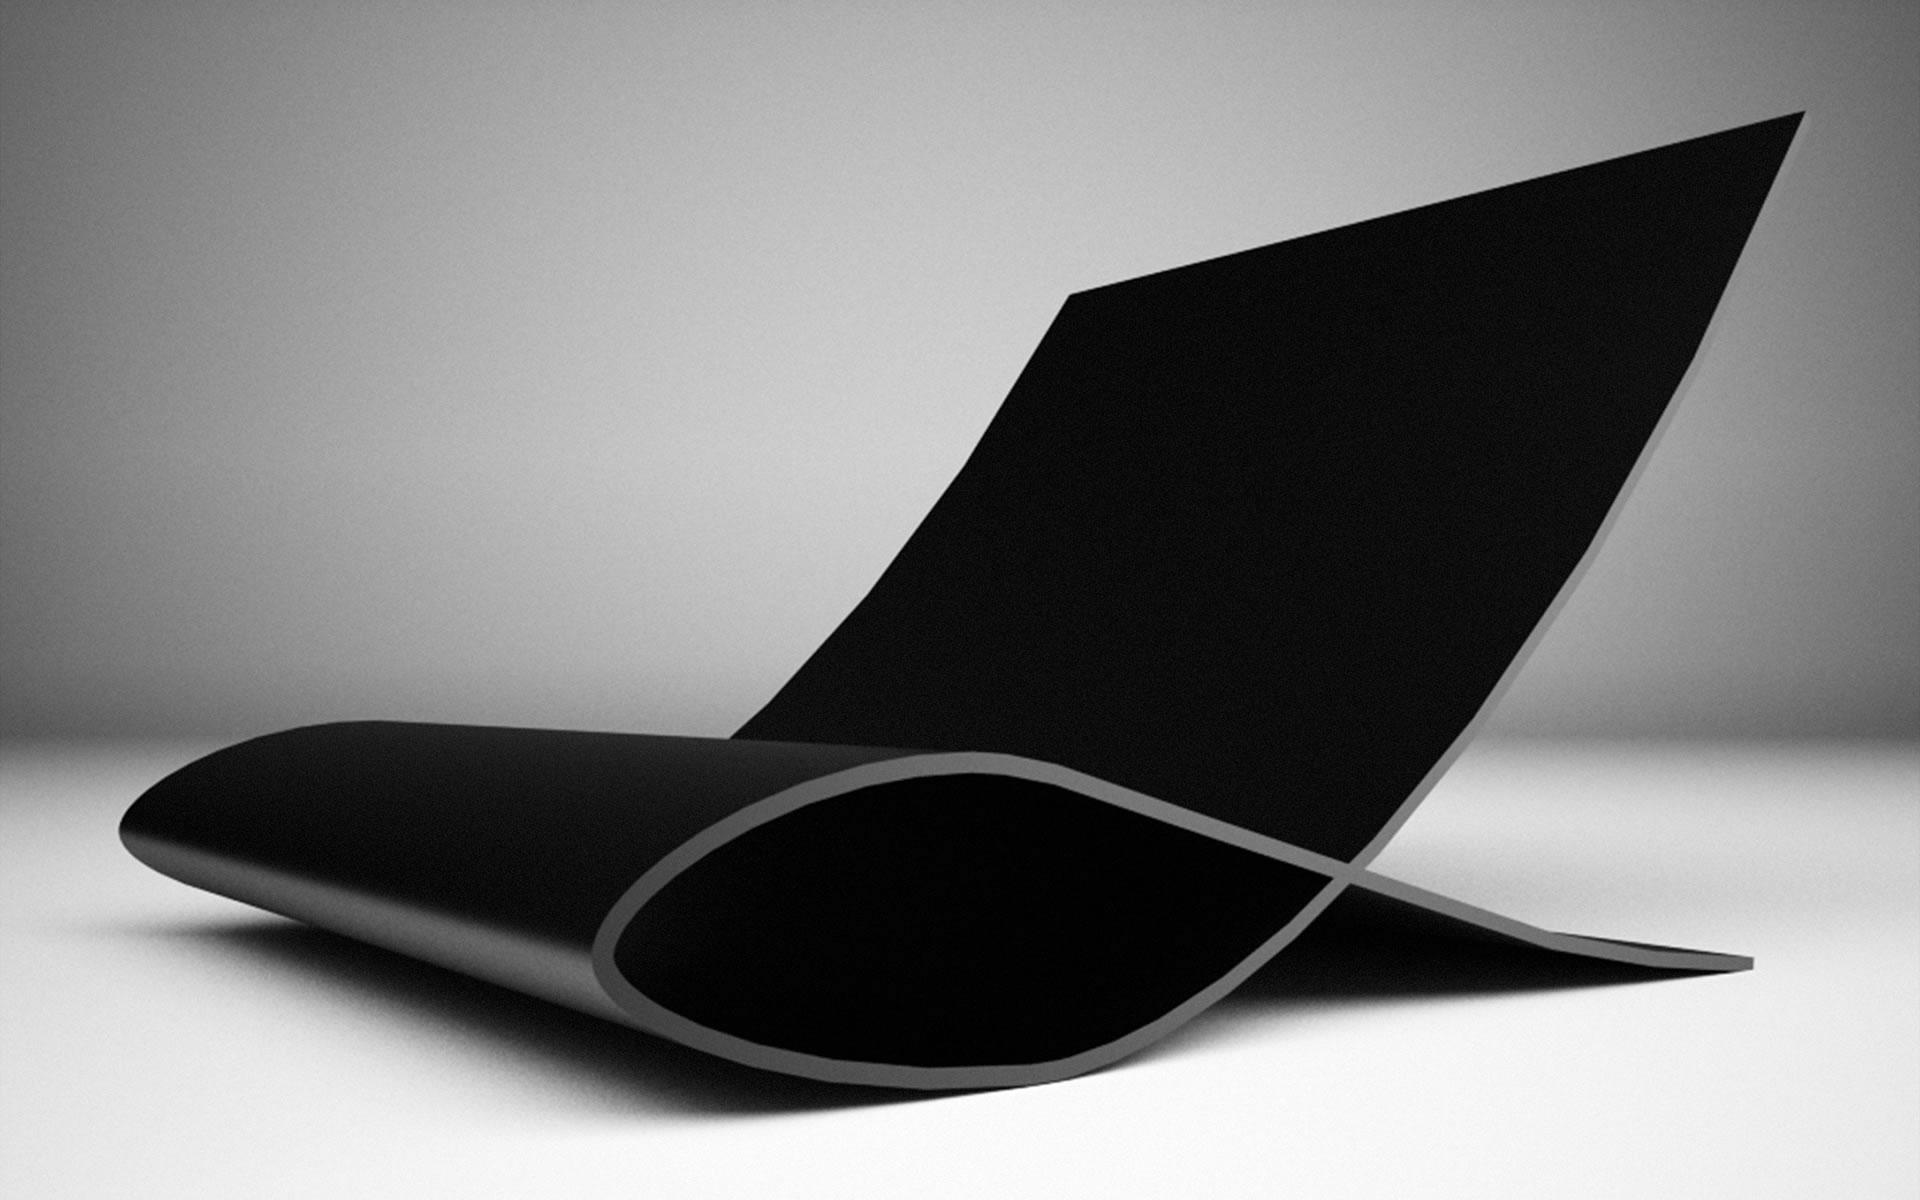 Sessel ALPHA bestellen ▭ weisser Design-Sessel von RECHTECK